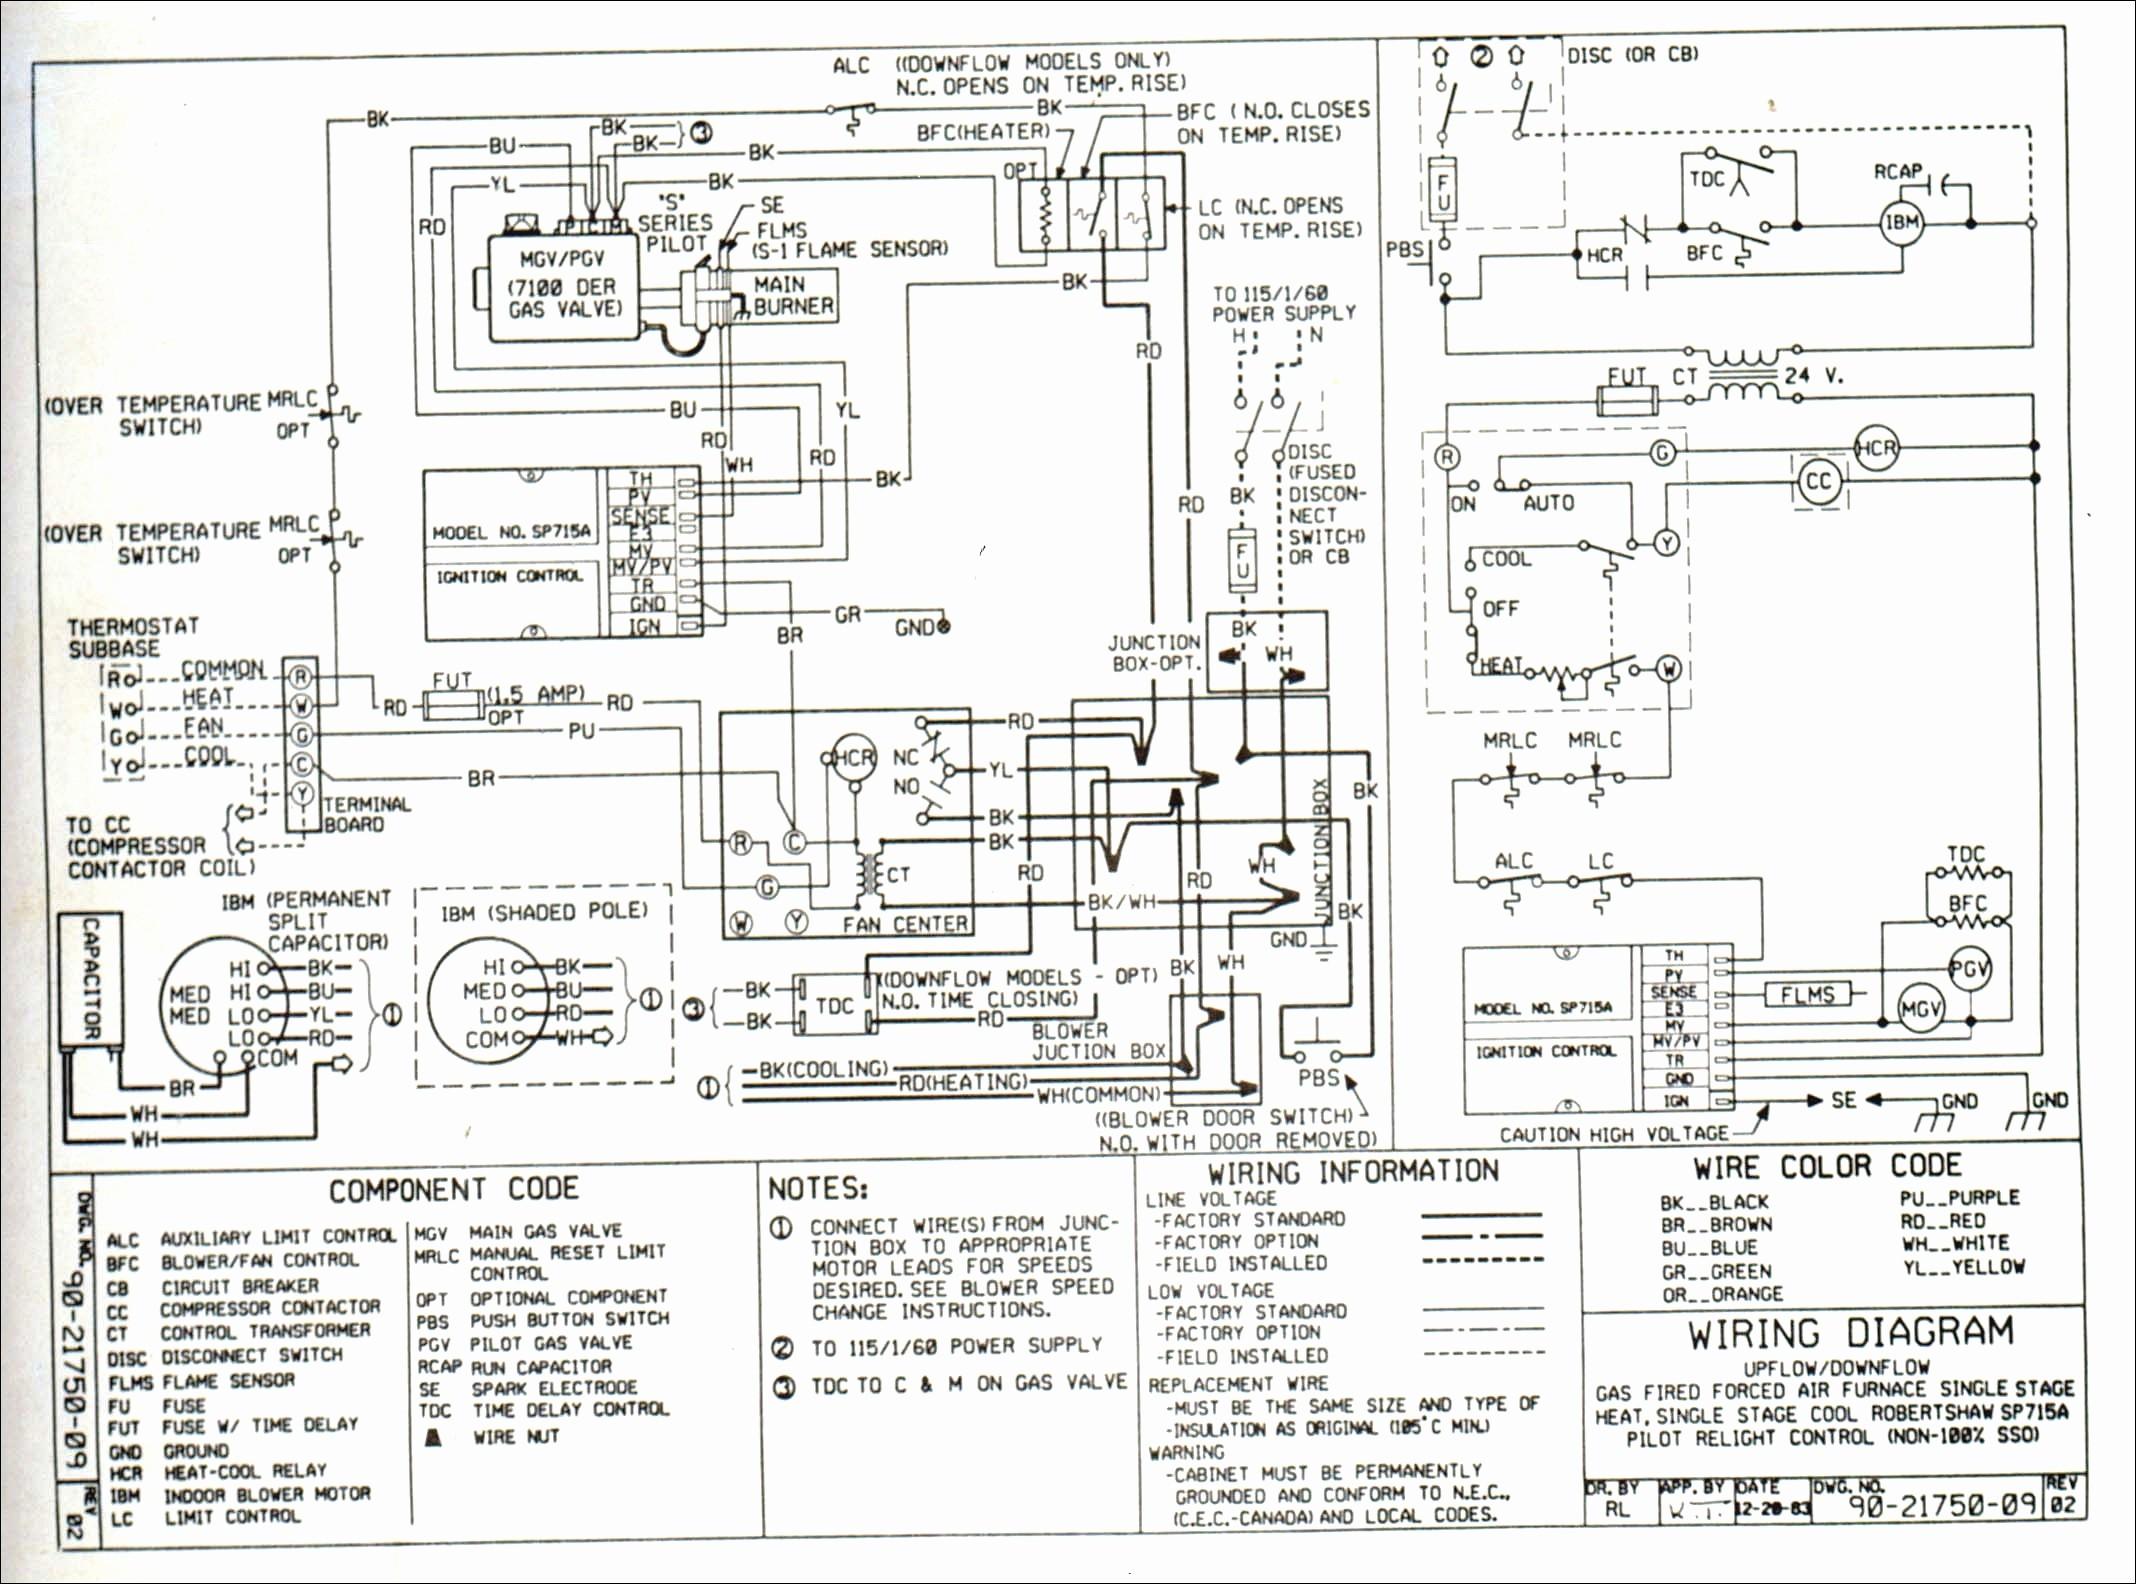 Superb Electrical Wiring Diagram Ford Motorhome Online Wiring Diagram Wiring Cloud Ymoonsalvmohammedshrineorg